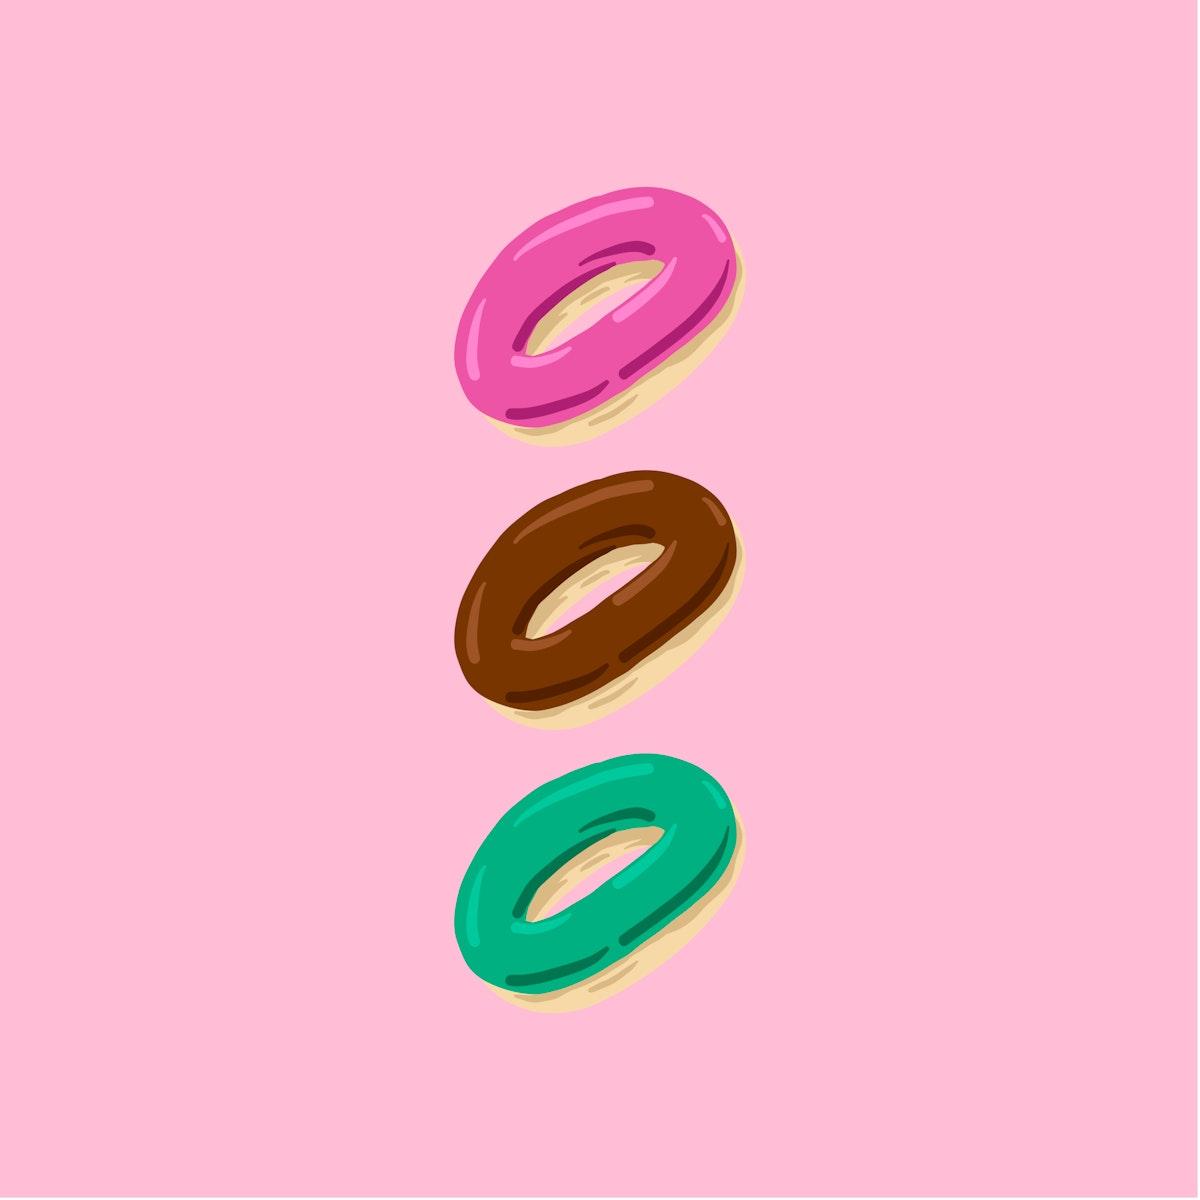 Three colorful glazed doughnuts illustration